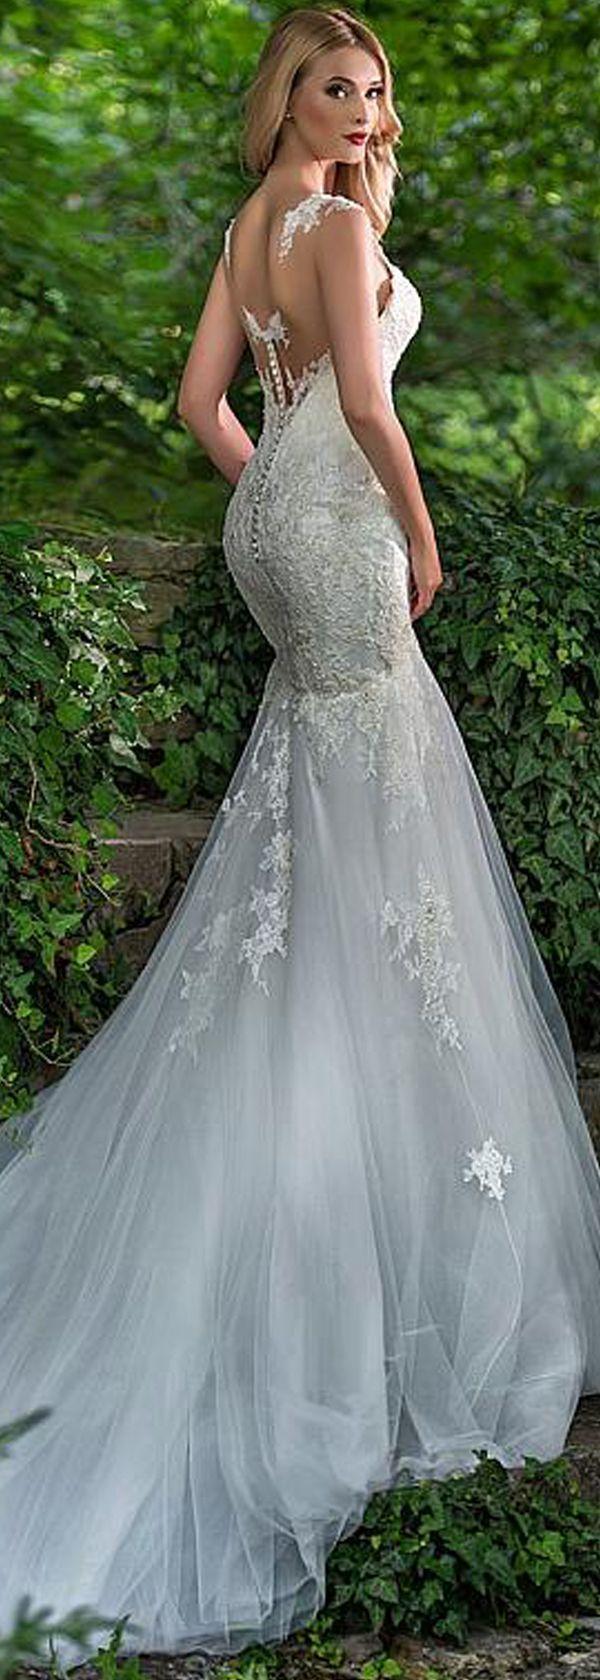 Mejores 9522 imágenes de Wedding Dresses en Pinterest   Vestidos de ...